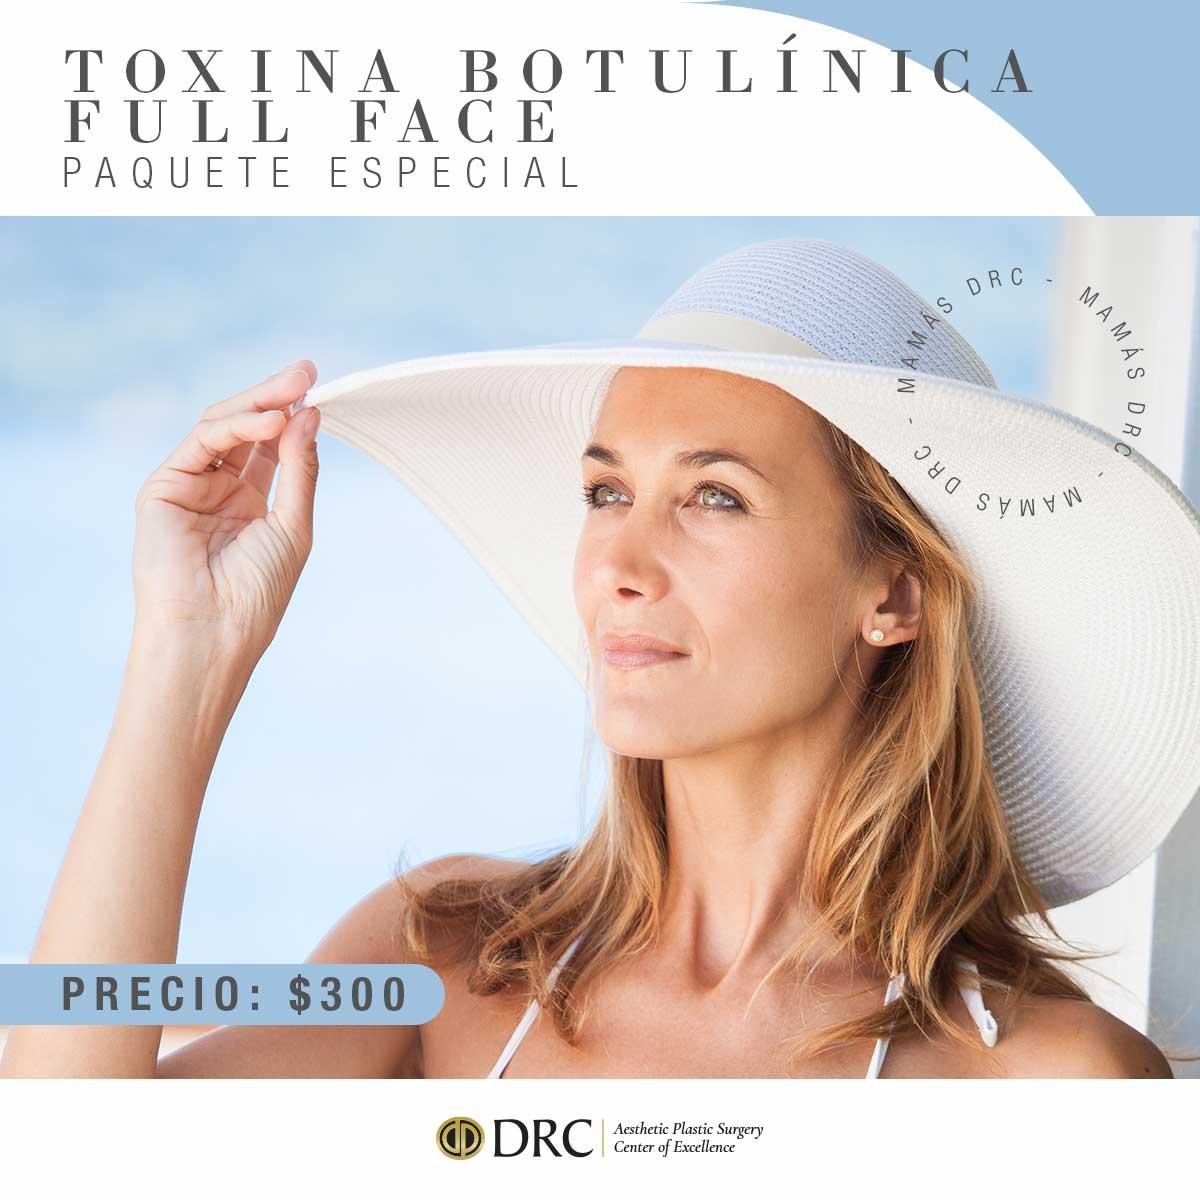 toxina-botulinica-fullface